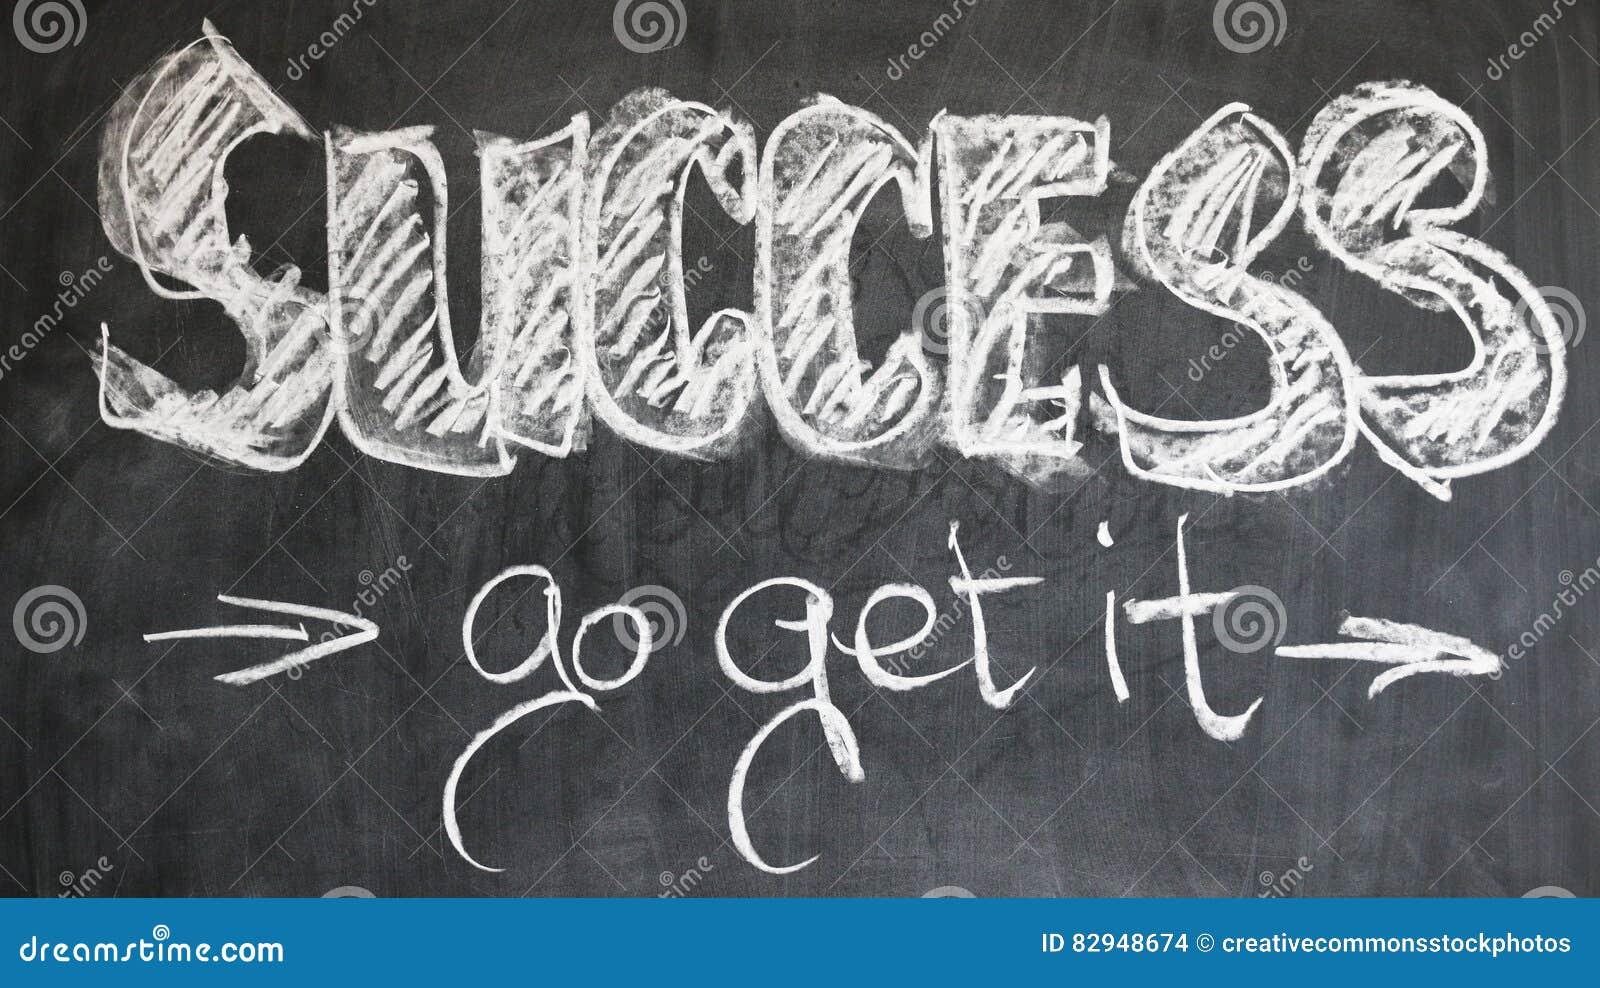 Success inspirational message